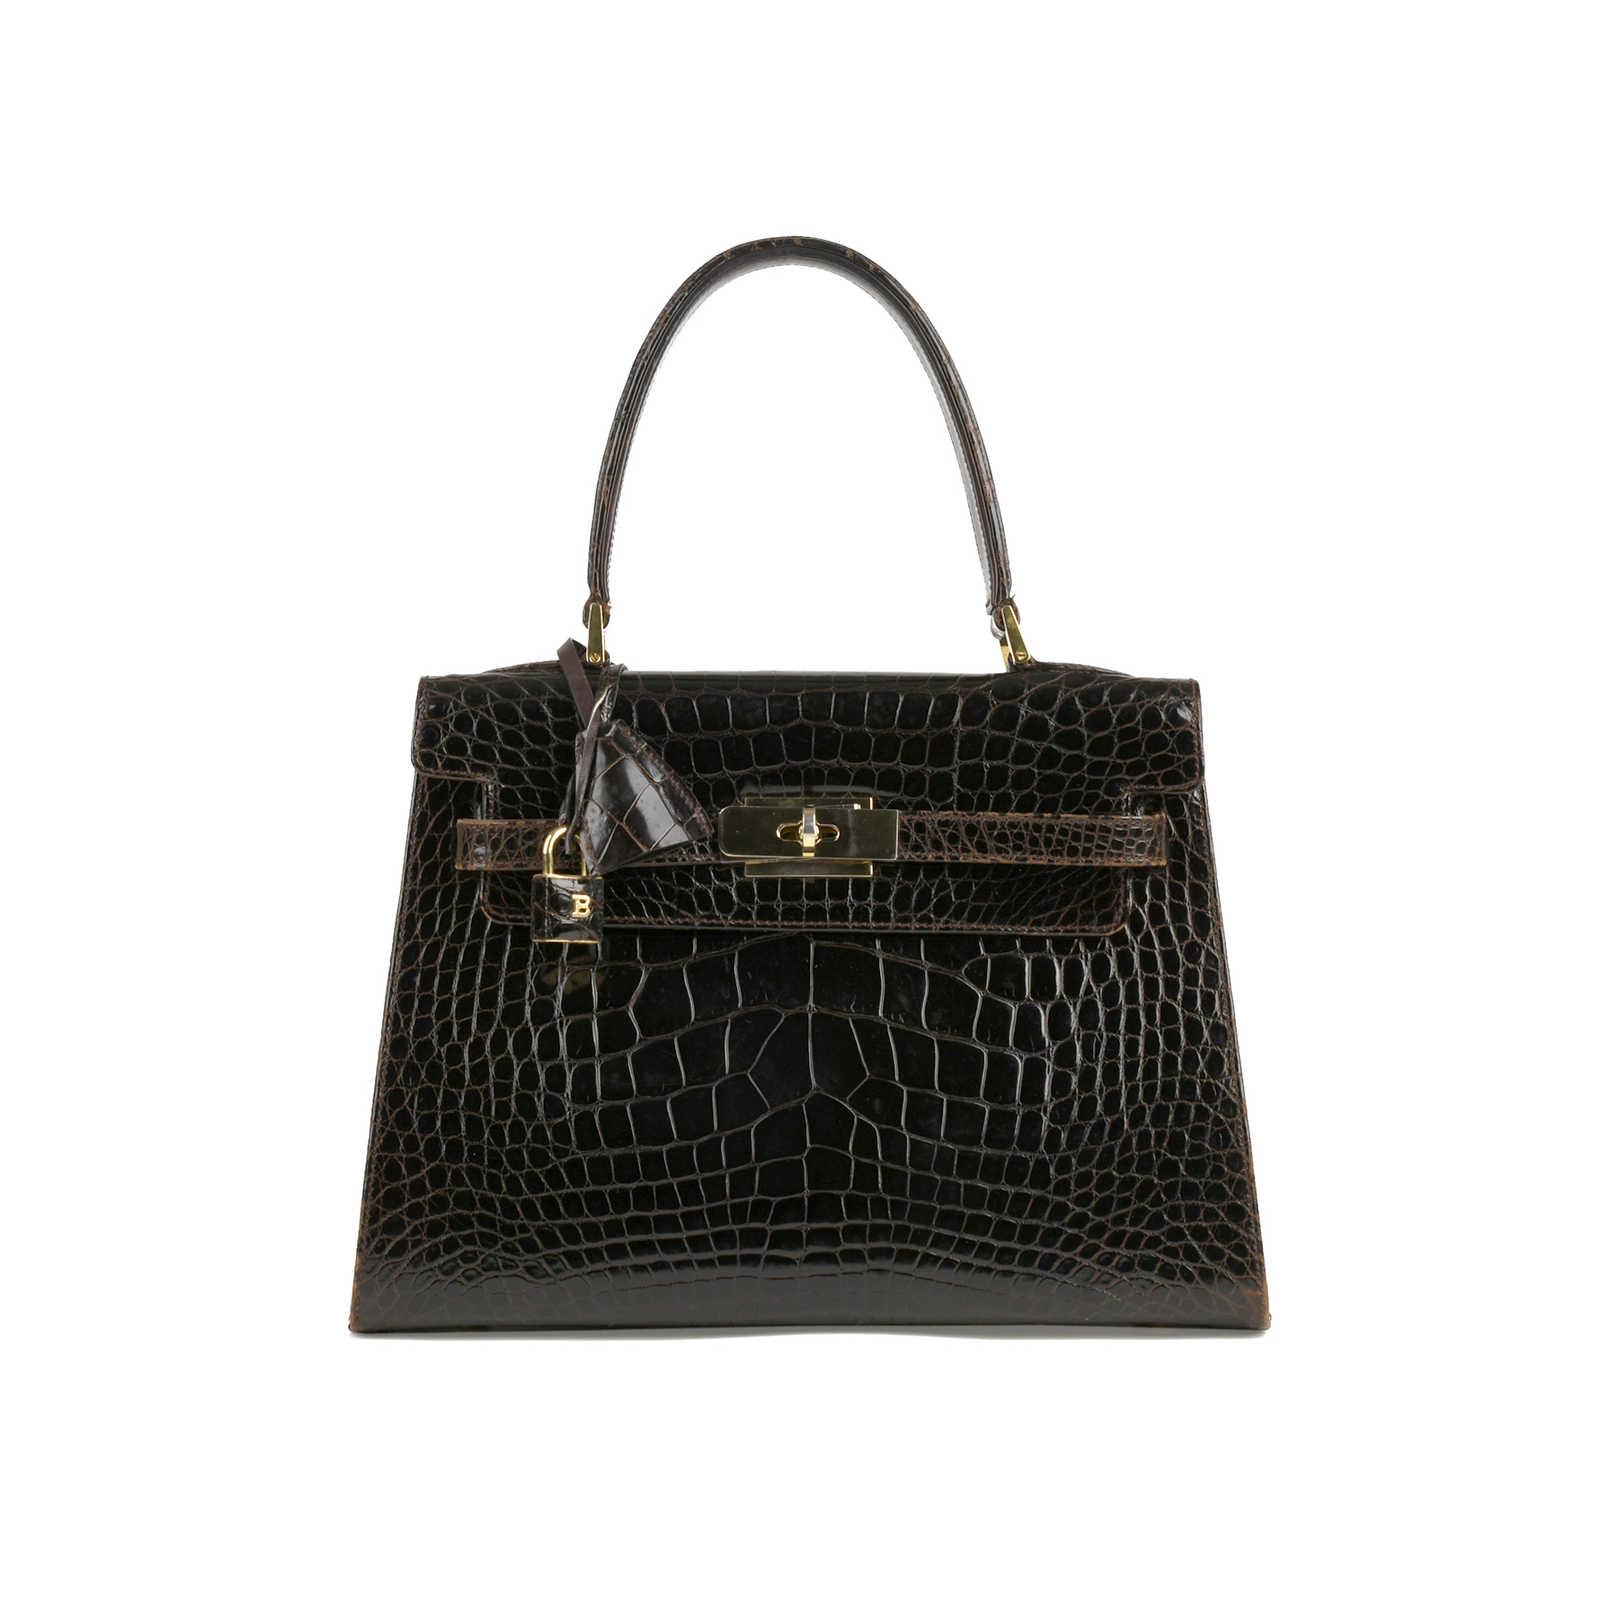 234496dc0129e1 Authentic Vintage Bally Kelly Style Bag (PSS-355-00023) - Thumbnail 0 ...